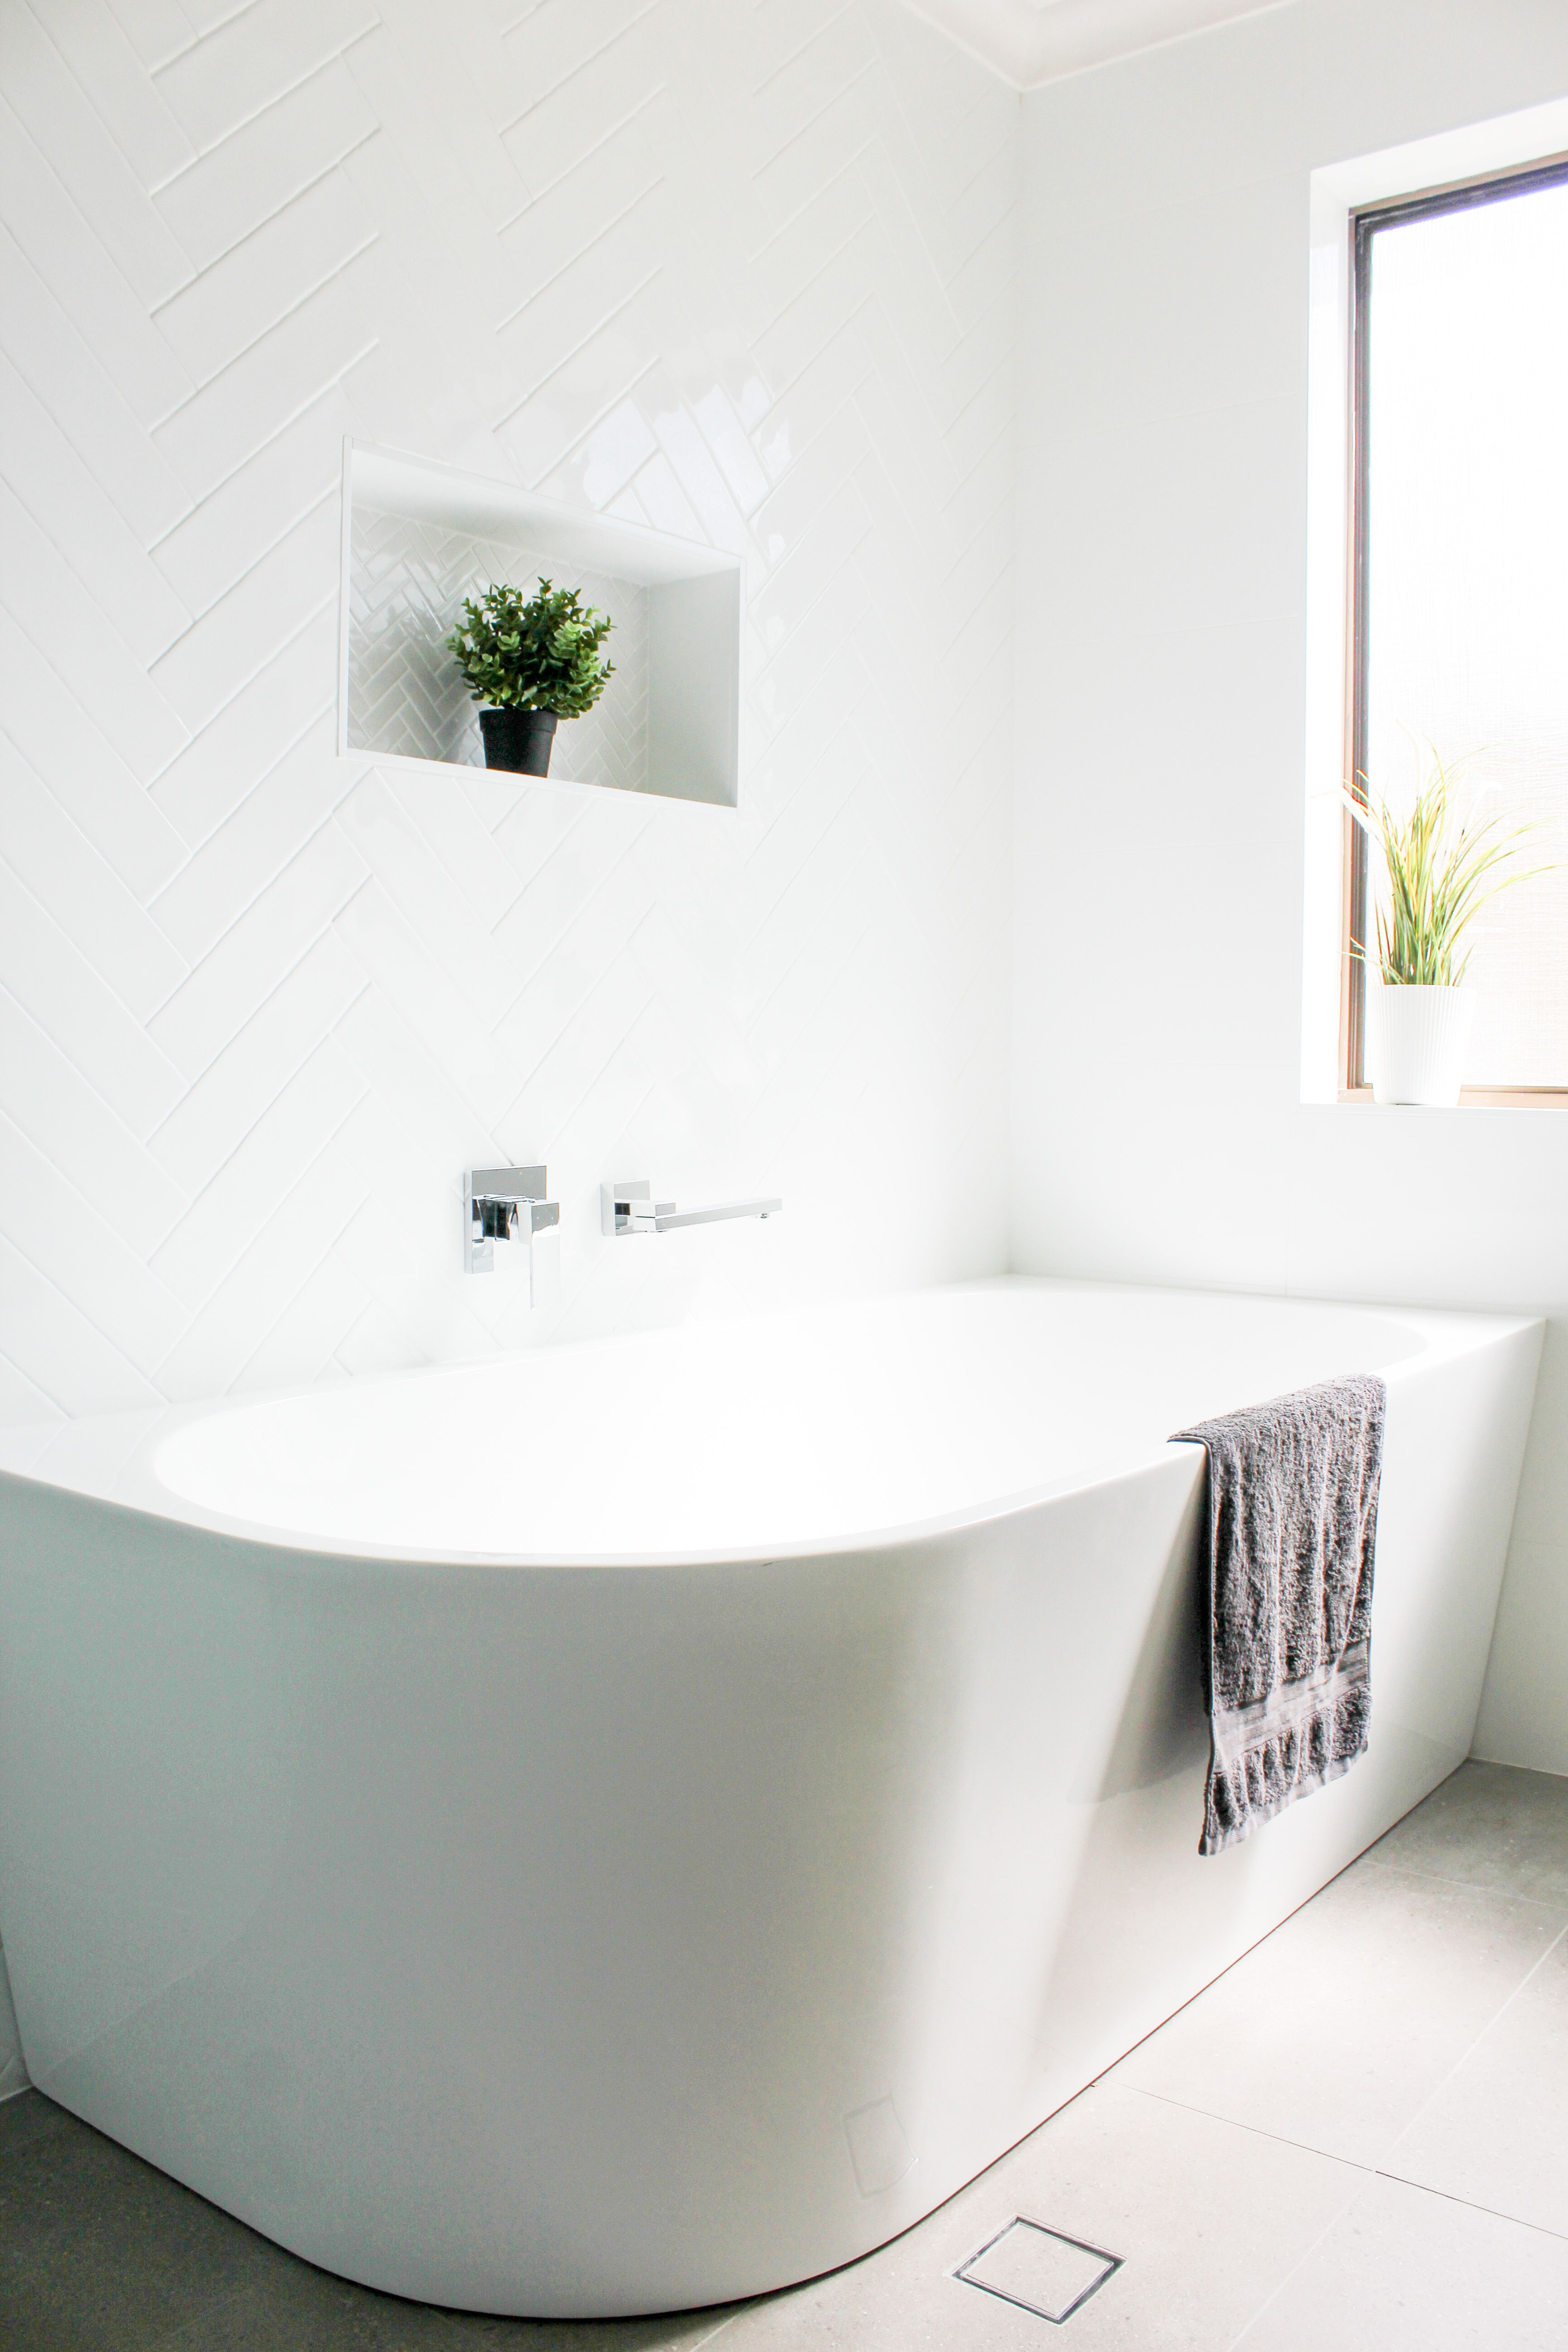 Freestanding Bath Subway Tiles Herrinbone Tiles Back To Wall Freestanding Bath Shower Niche Ful In 2020 Back To Wall Bath Bathroom Freestanding Free Standing Bath